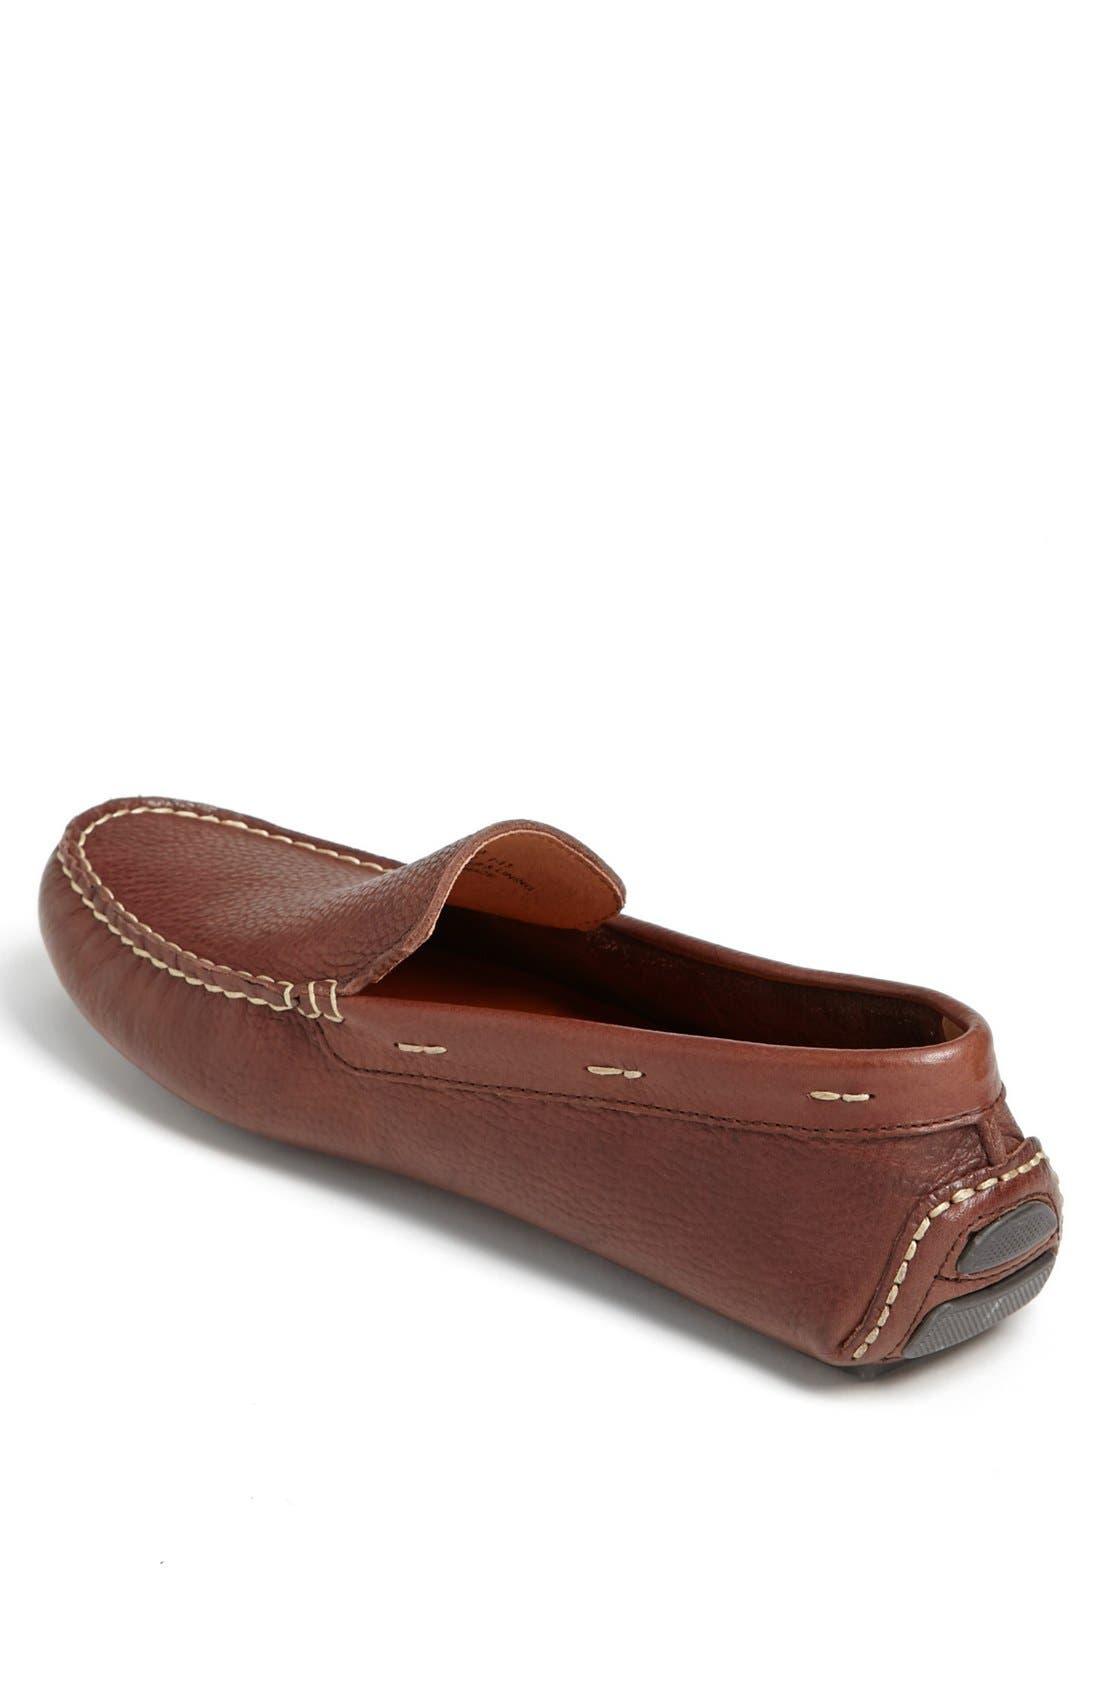 Alternate Image 2  - Tommy Bahama 'Pagota' Driving Shoe